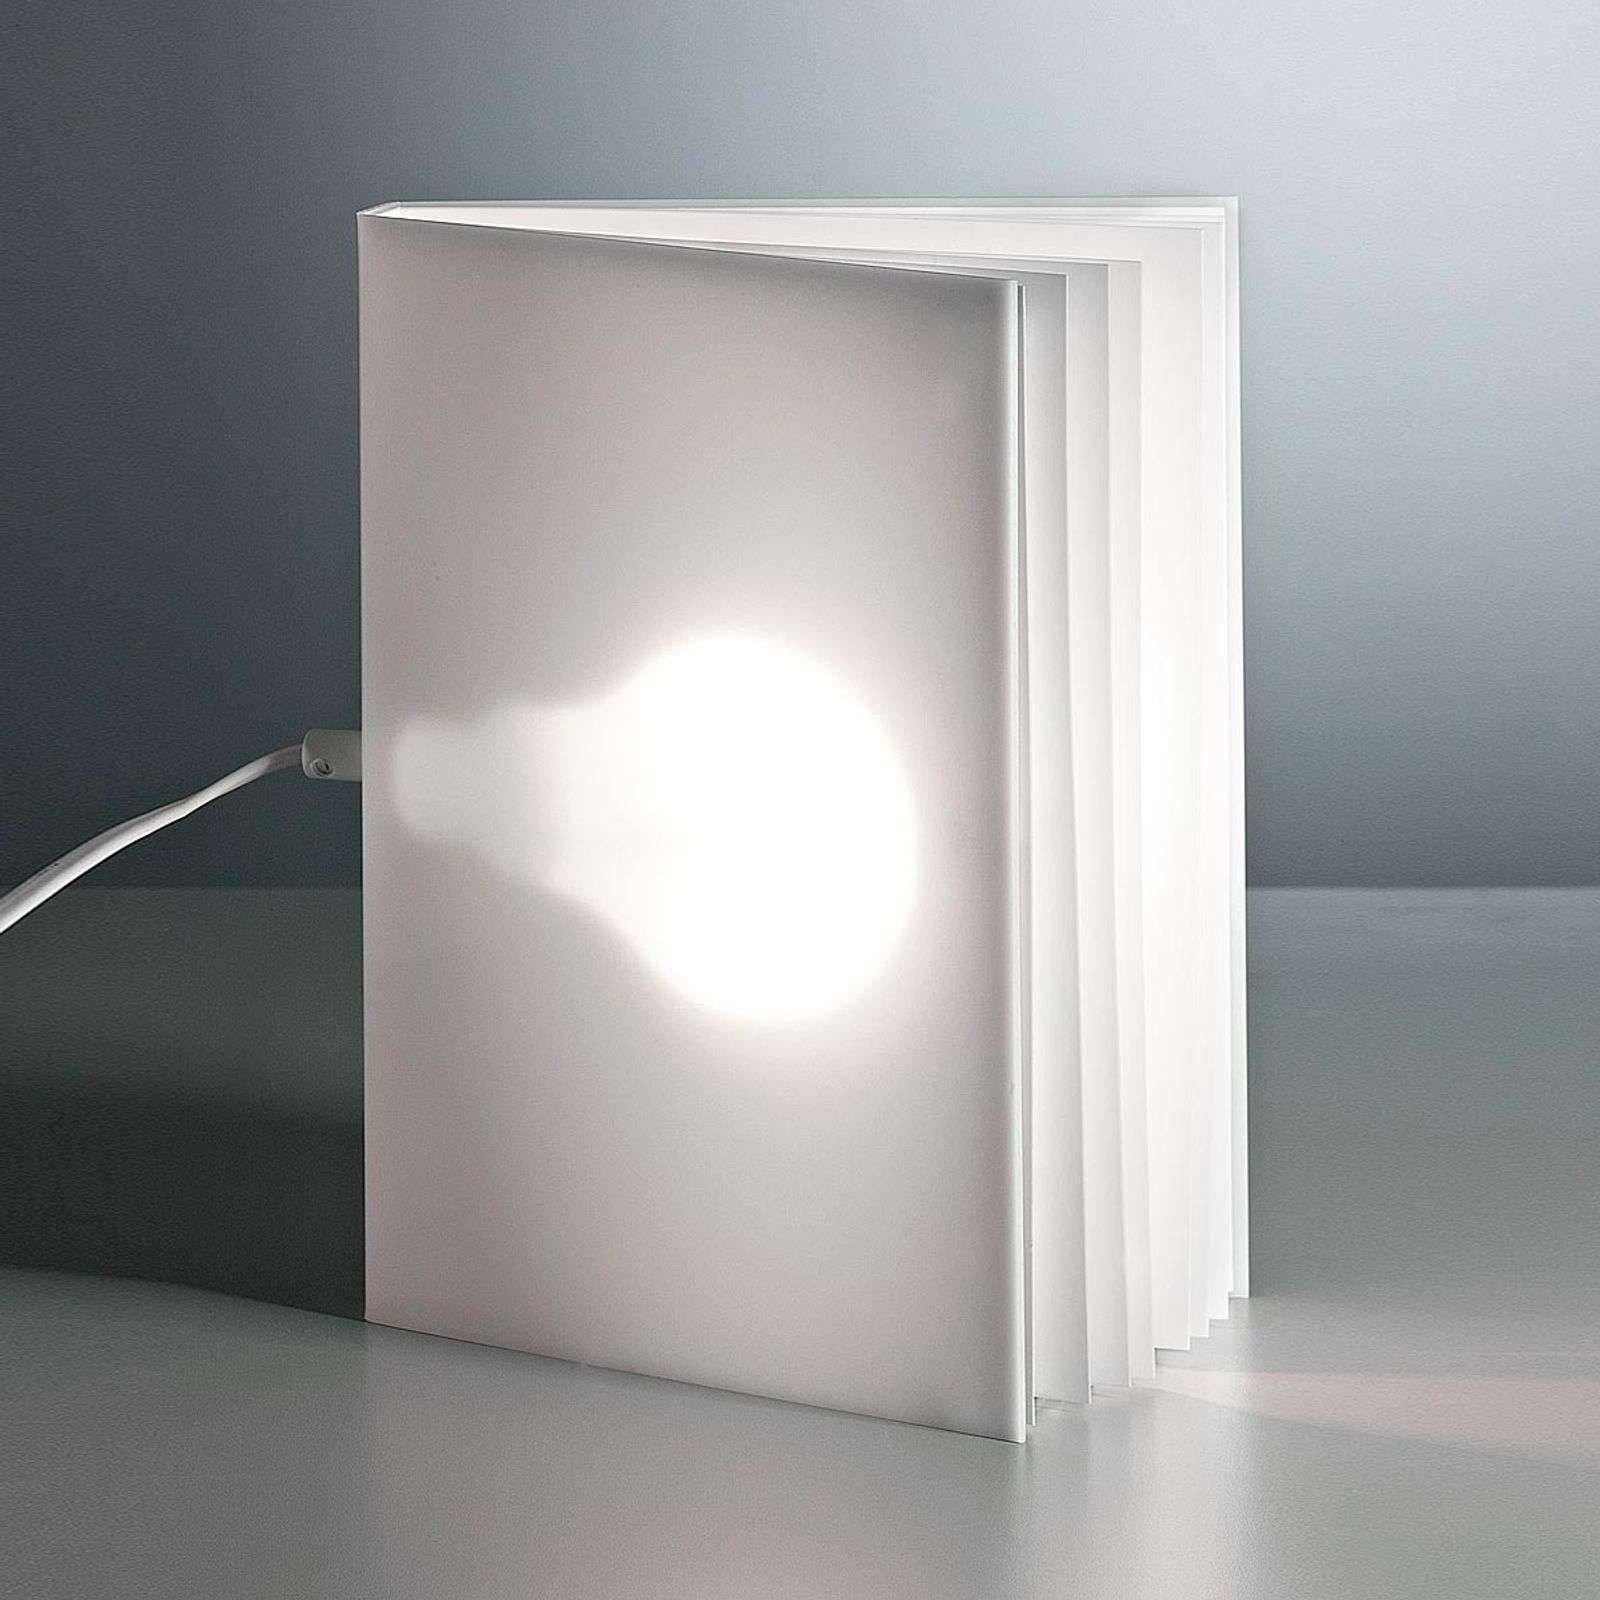 Tecnolumen BookLight table lamp by Vincenz Warnke